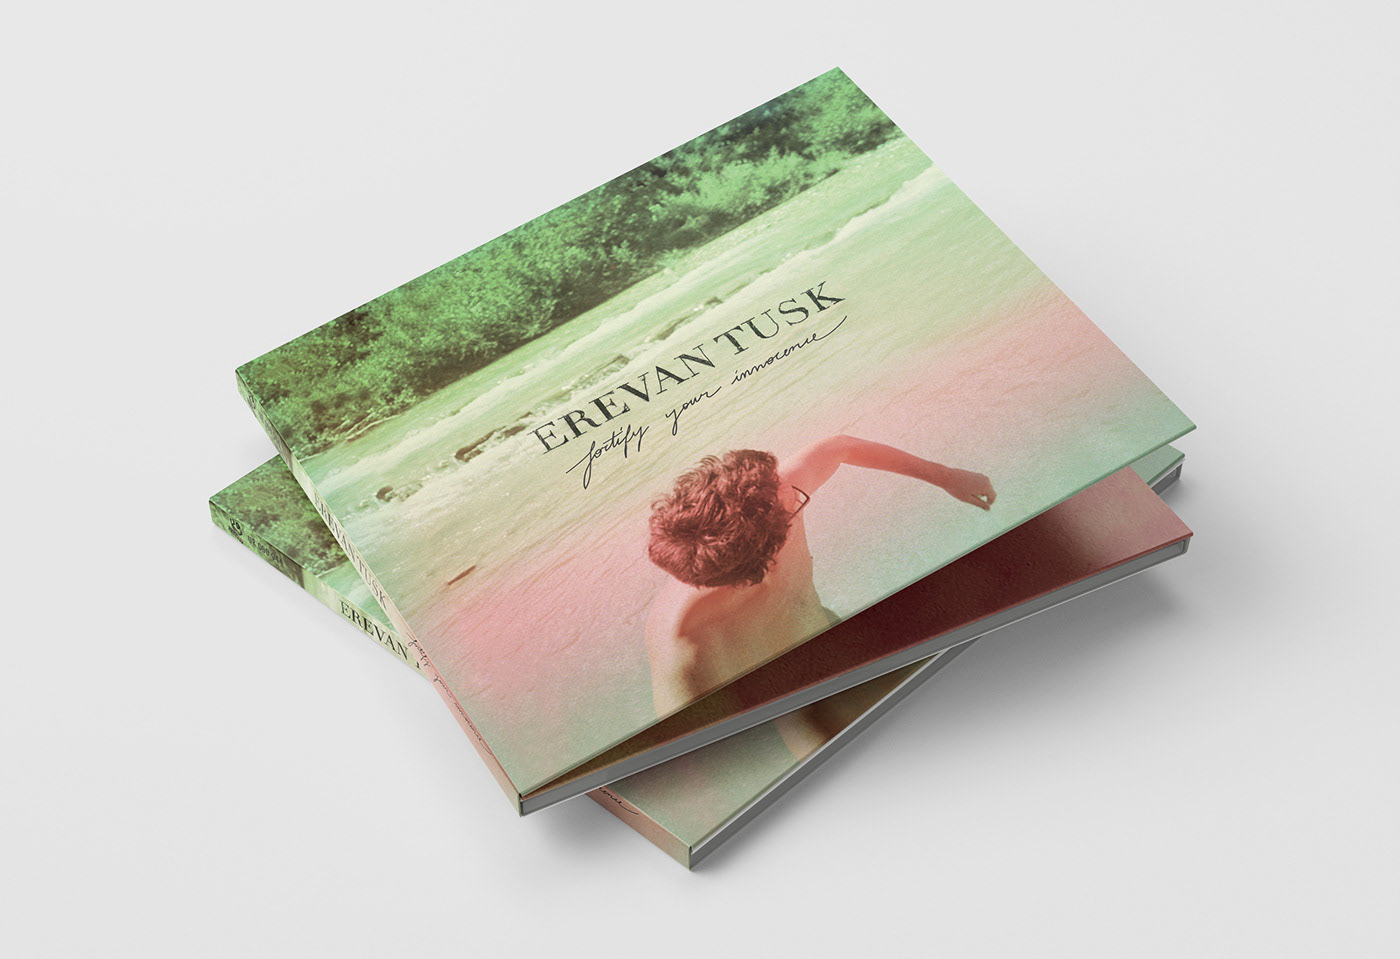 EREVAN TUSK COVER ALBUM - commercial cover